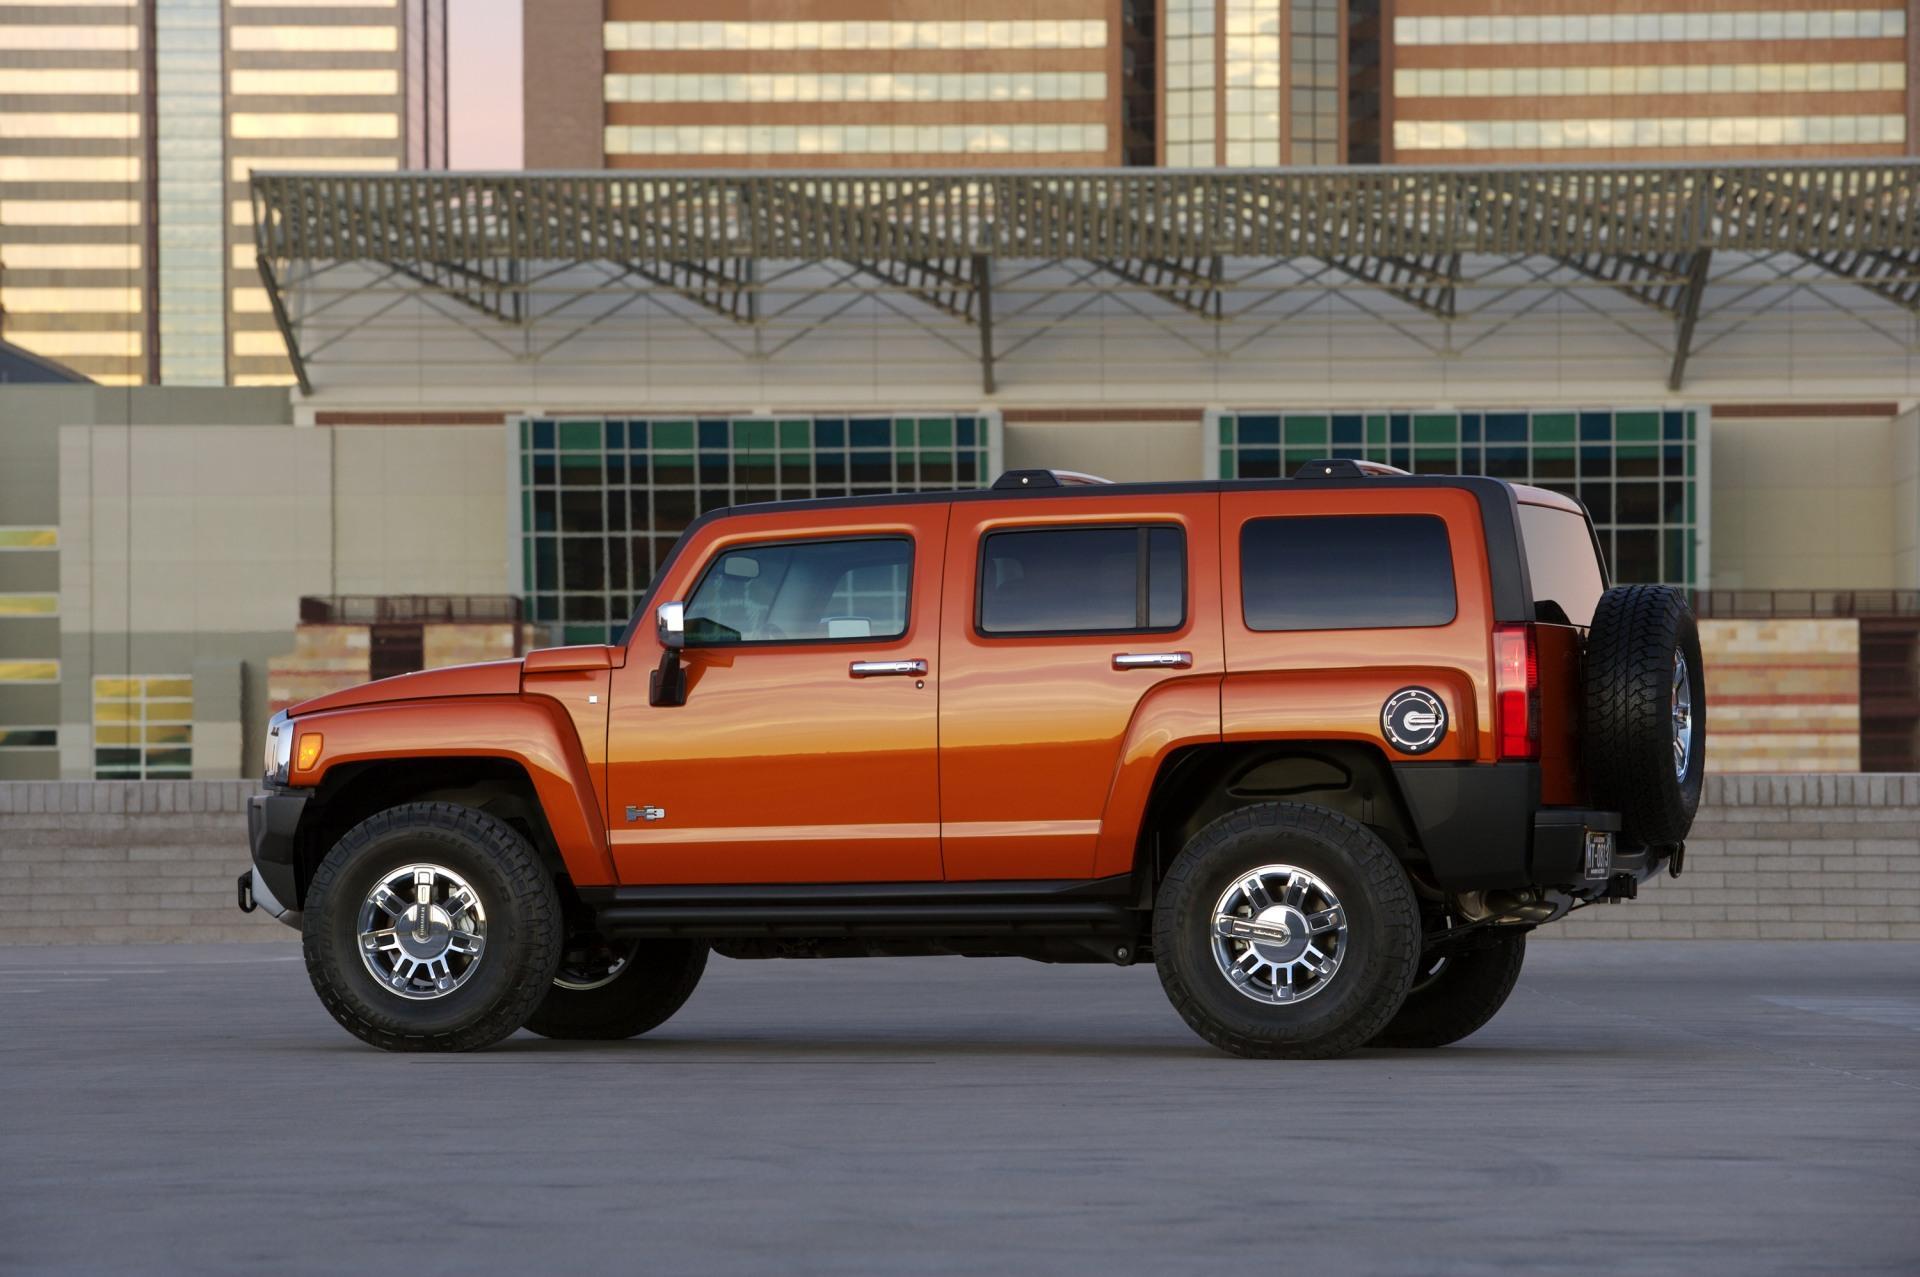 2010 Hummer H3 conceptcarz